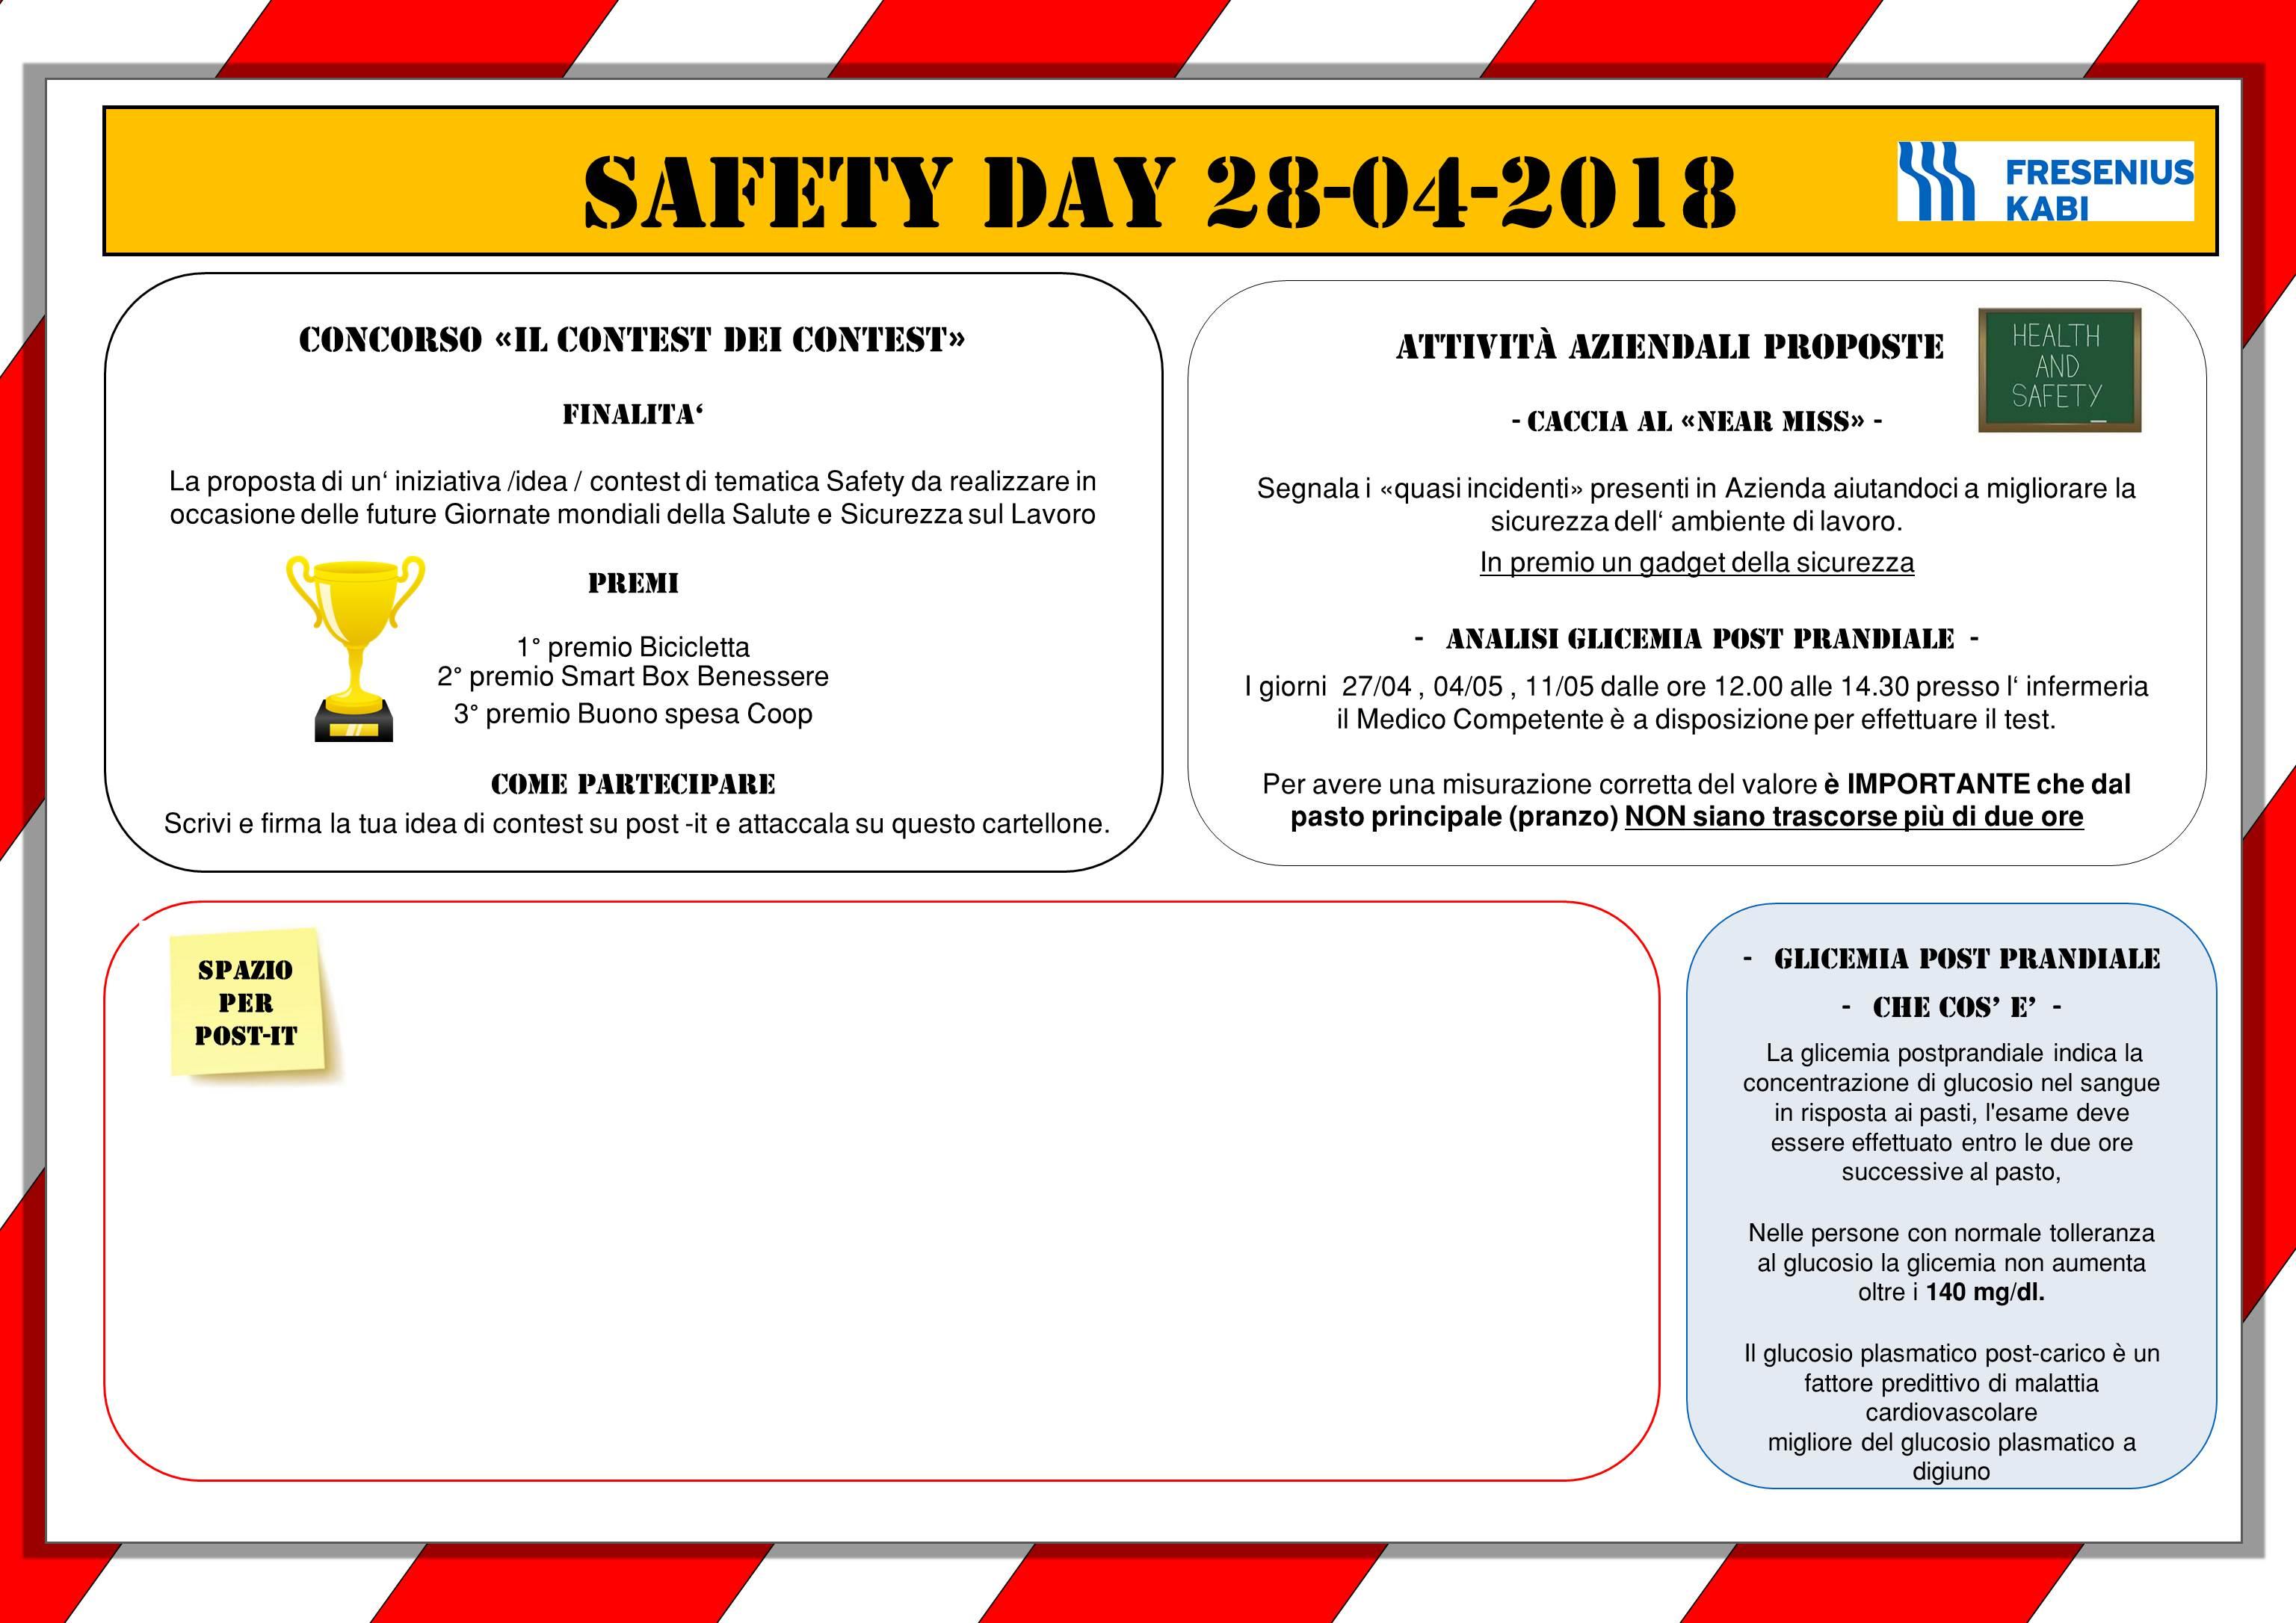 https://www.fondlhs.org/wp-content/uploads/2018/04/Cartellone-Safety-DayREV01.jpg